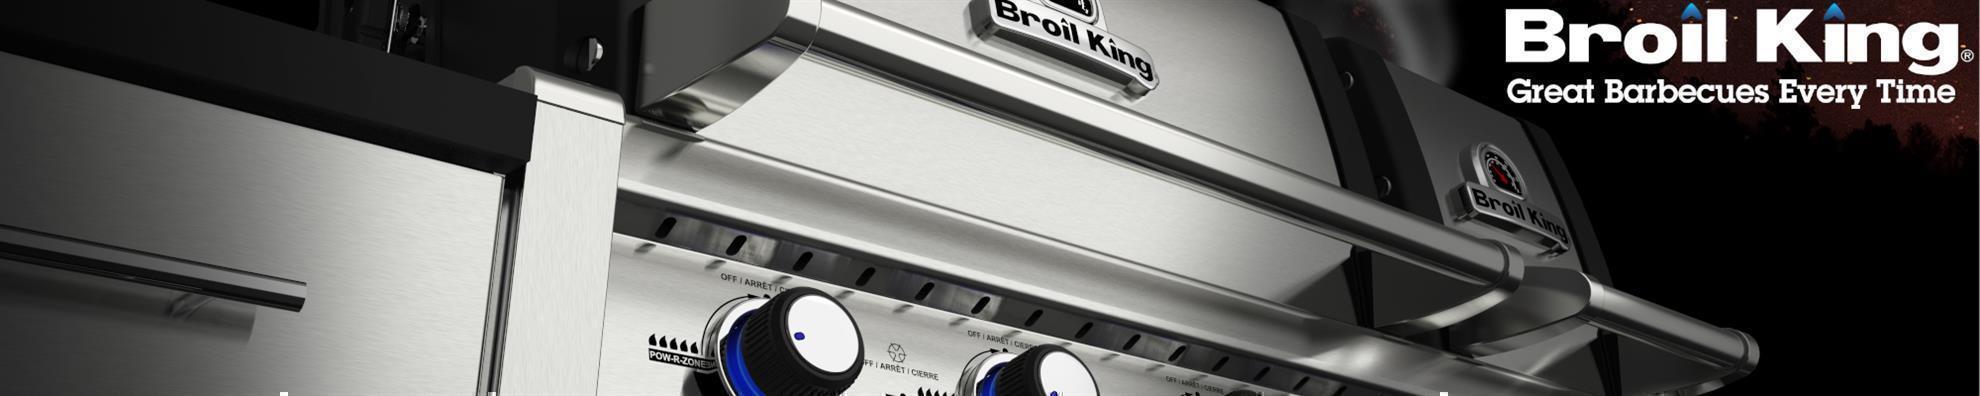 Broil King - GUSSPLATTE MONARCH™ SERIE, ROYAL™ SERIE